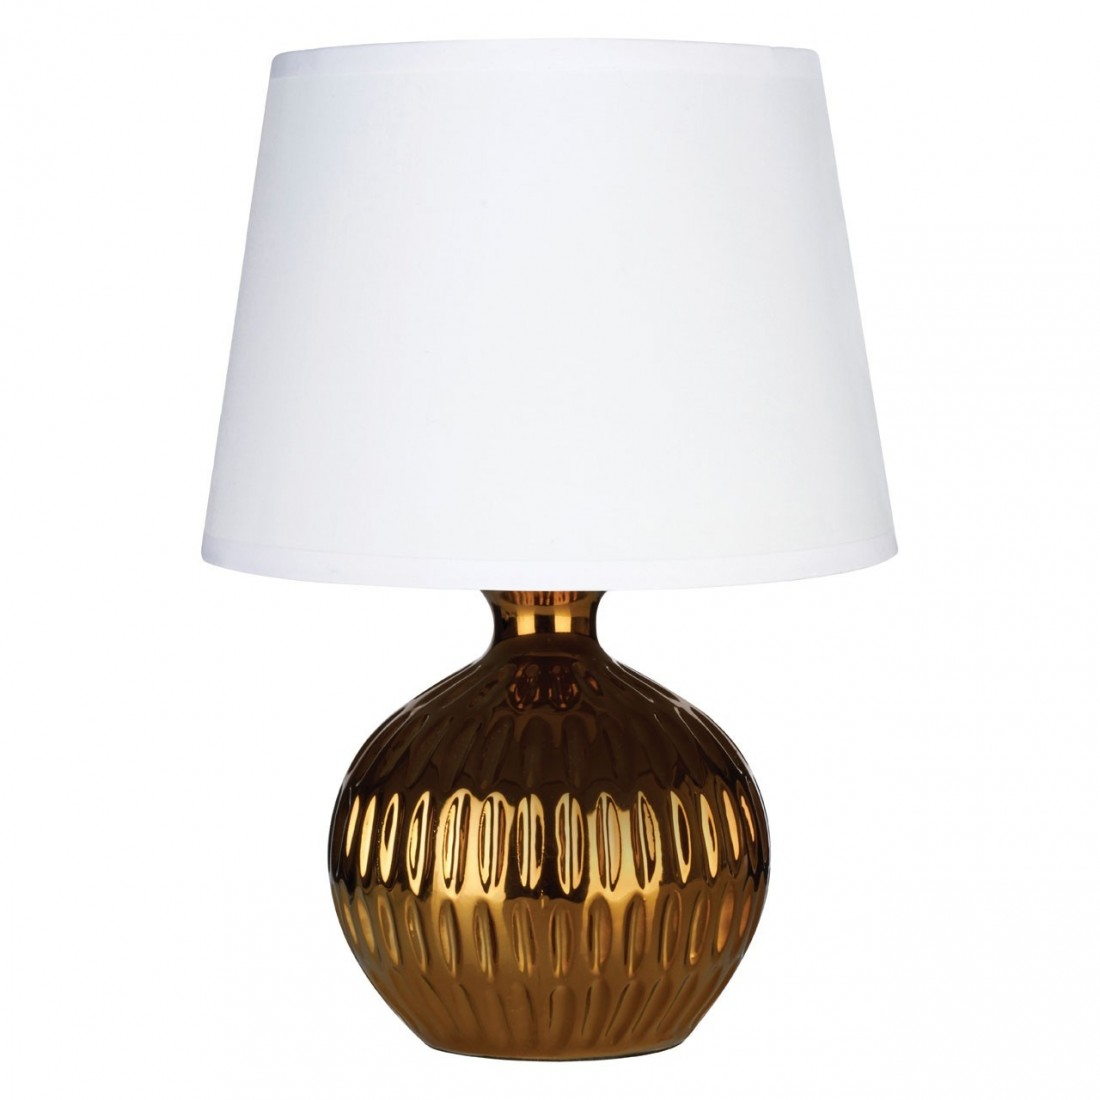 Kensington - Wren stolní lampa